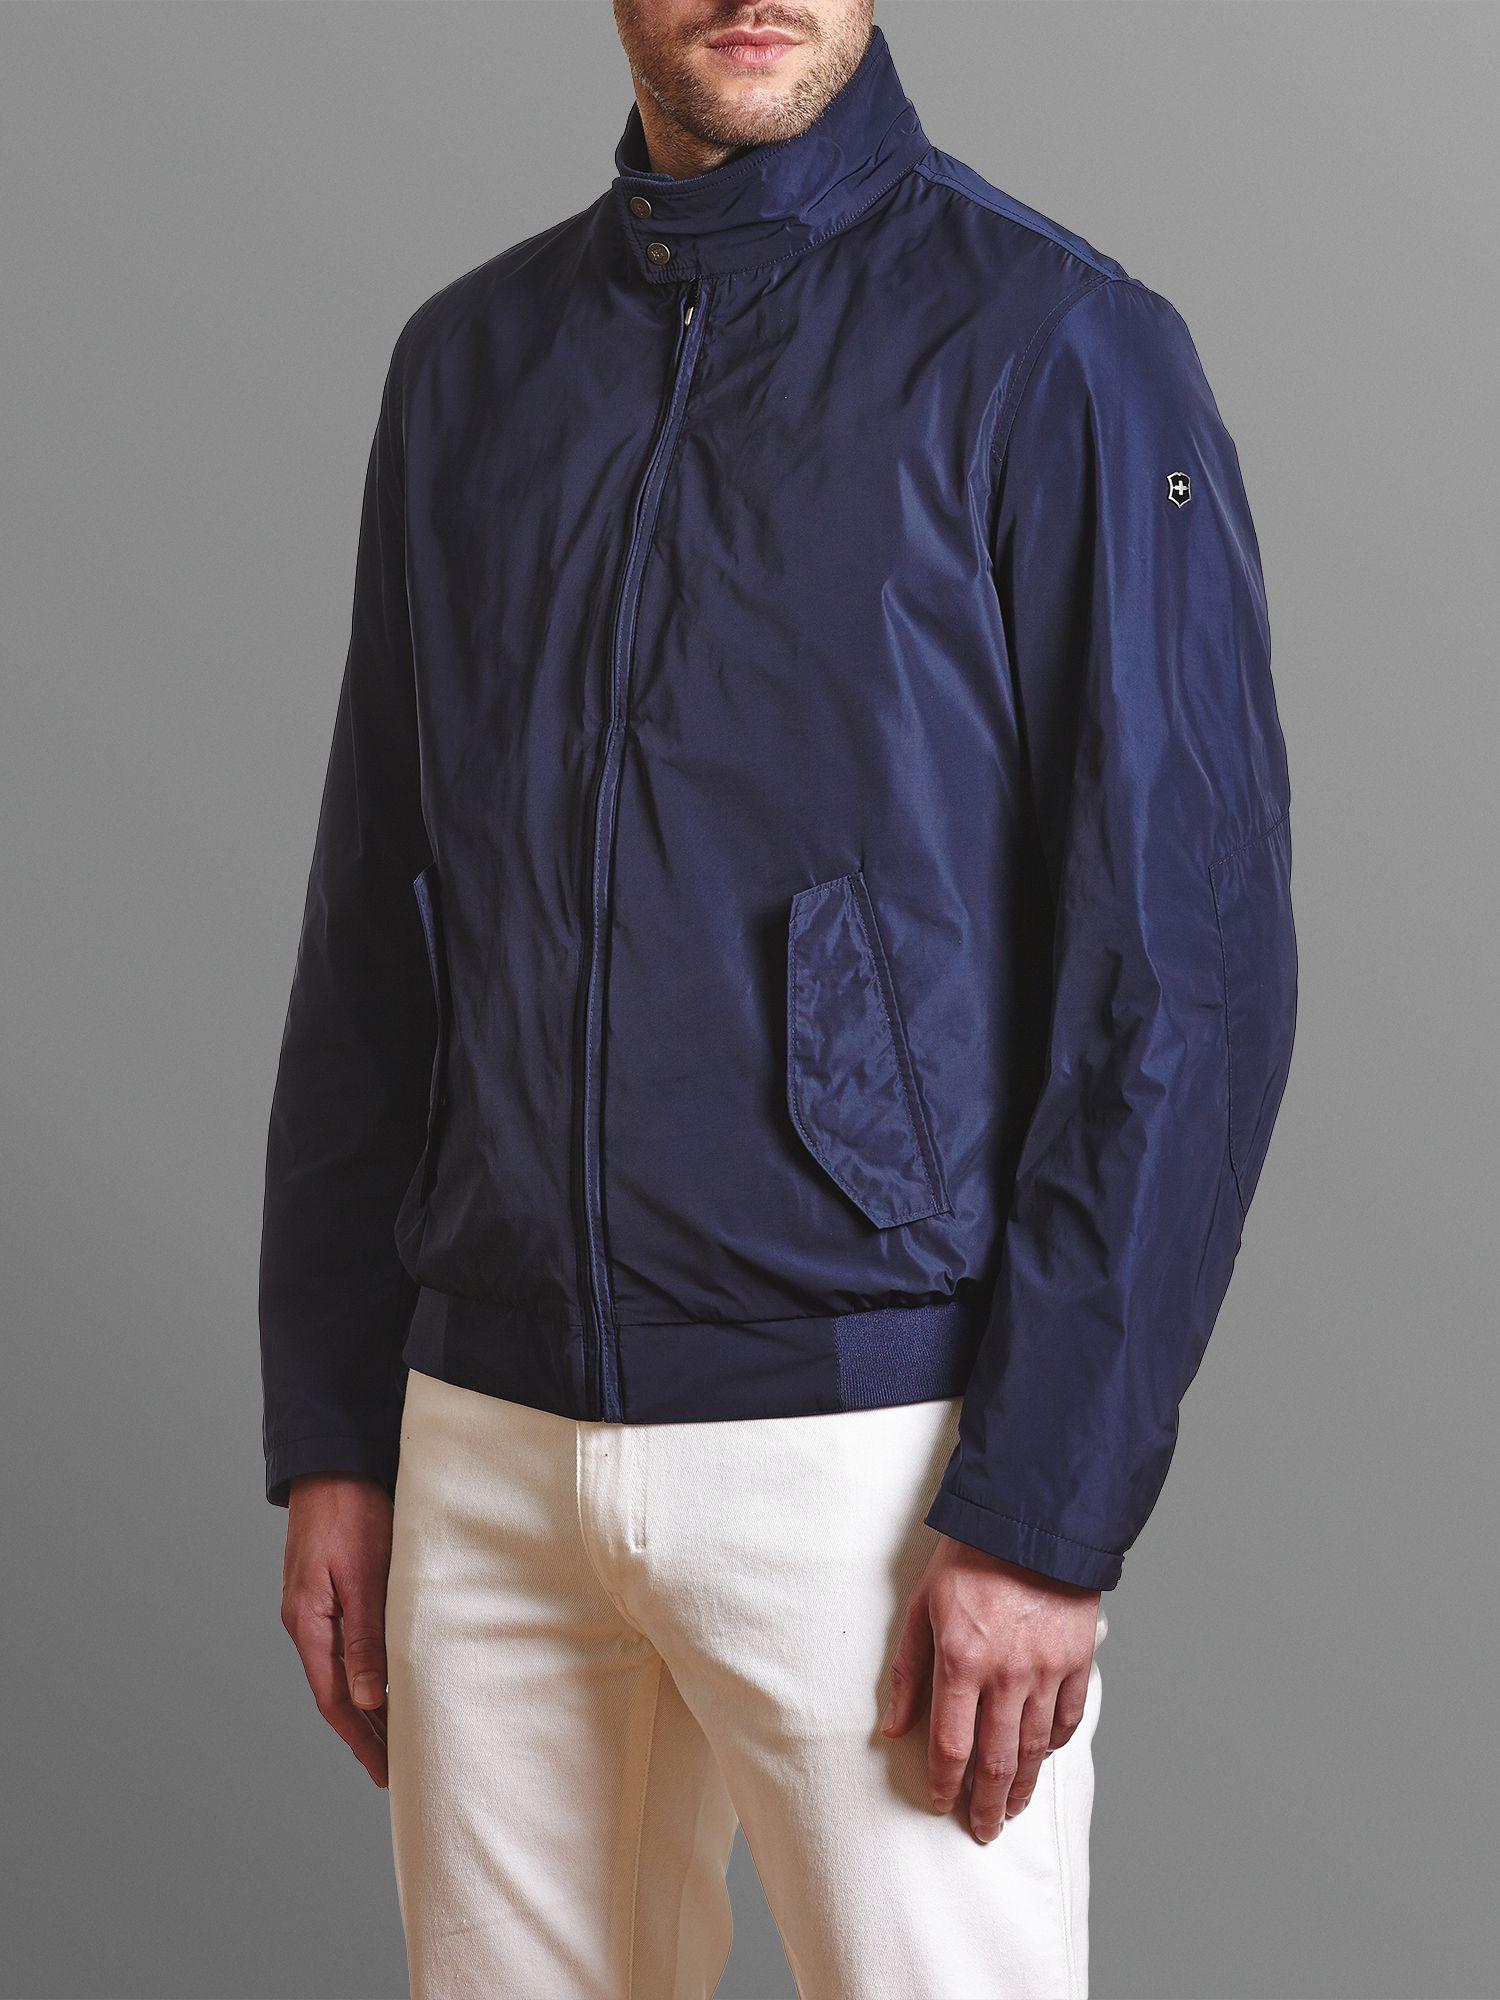 Victorinox Bomber Jacket in Navy (Blue) for Men